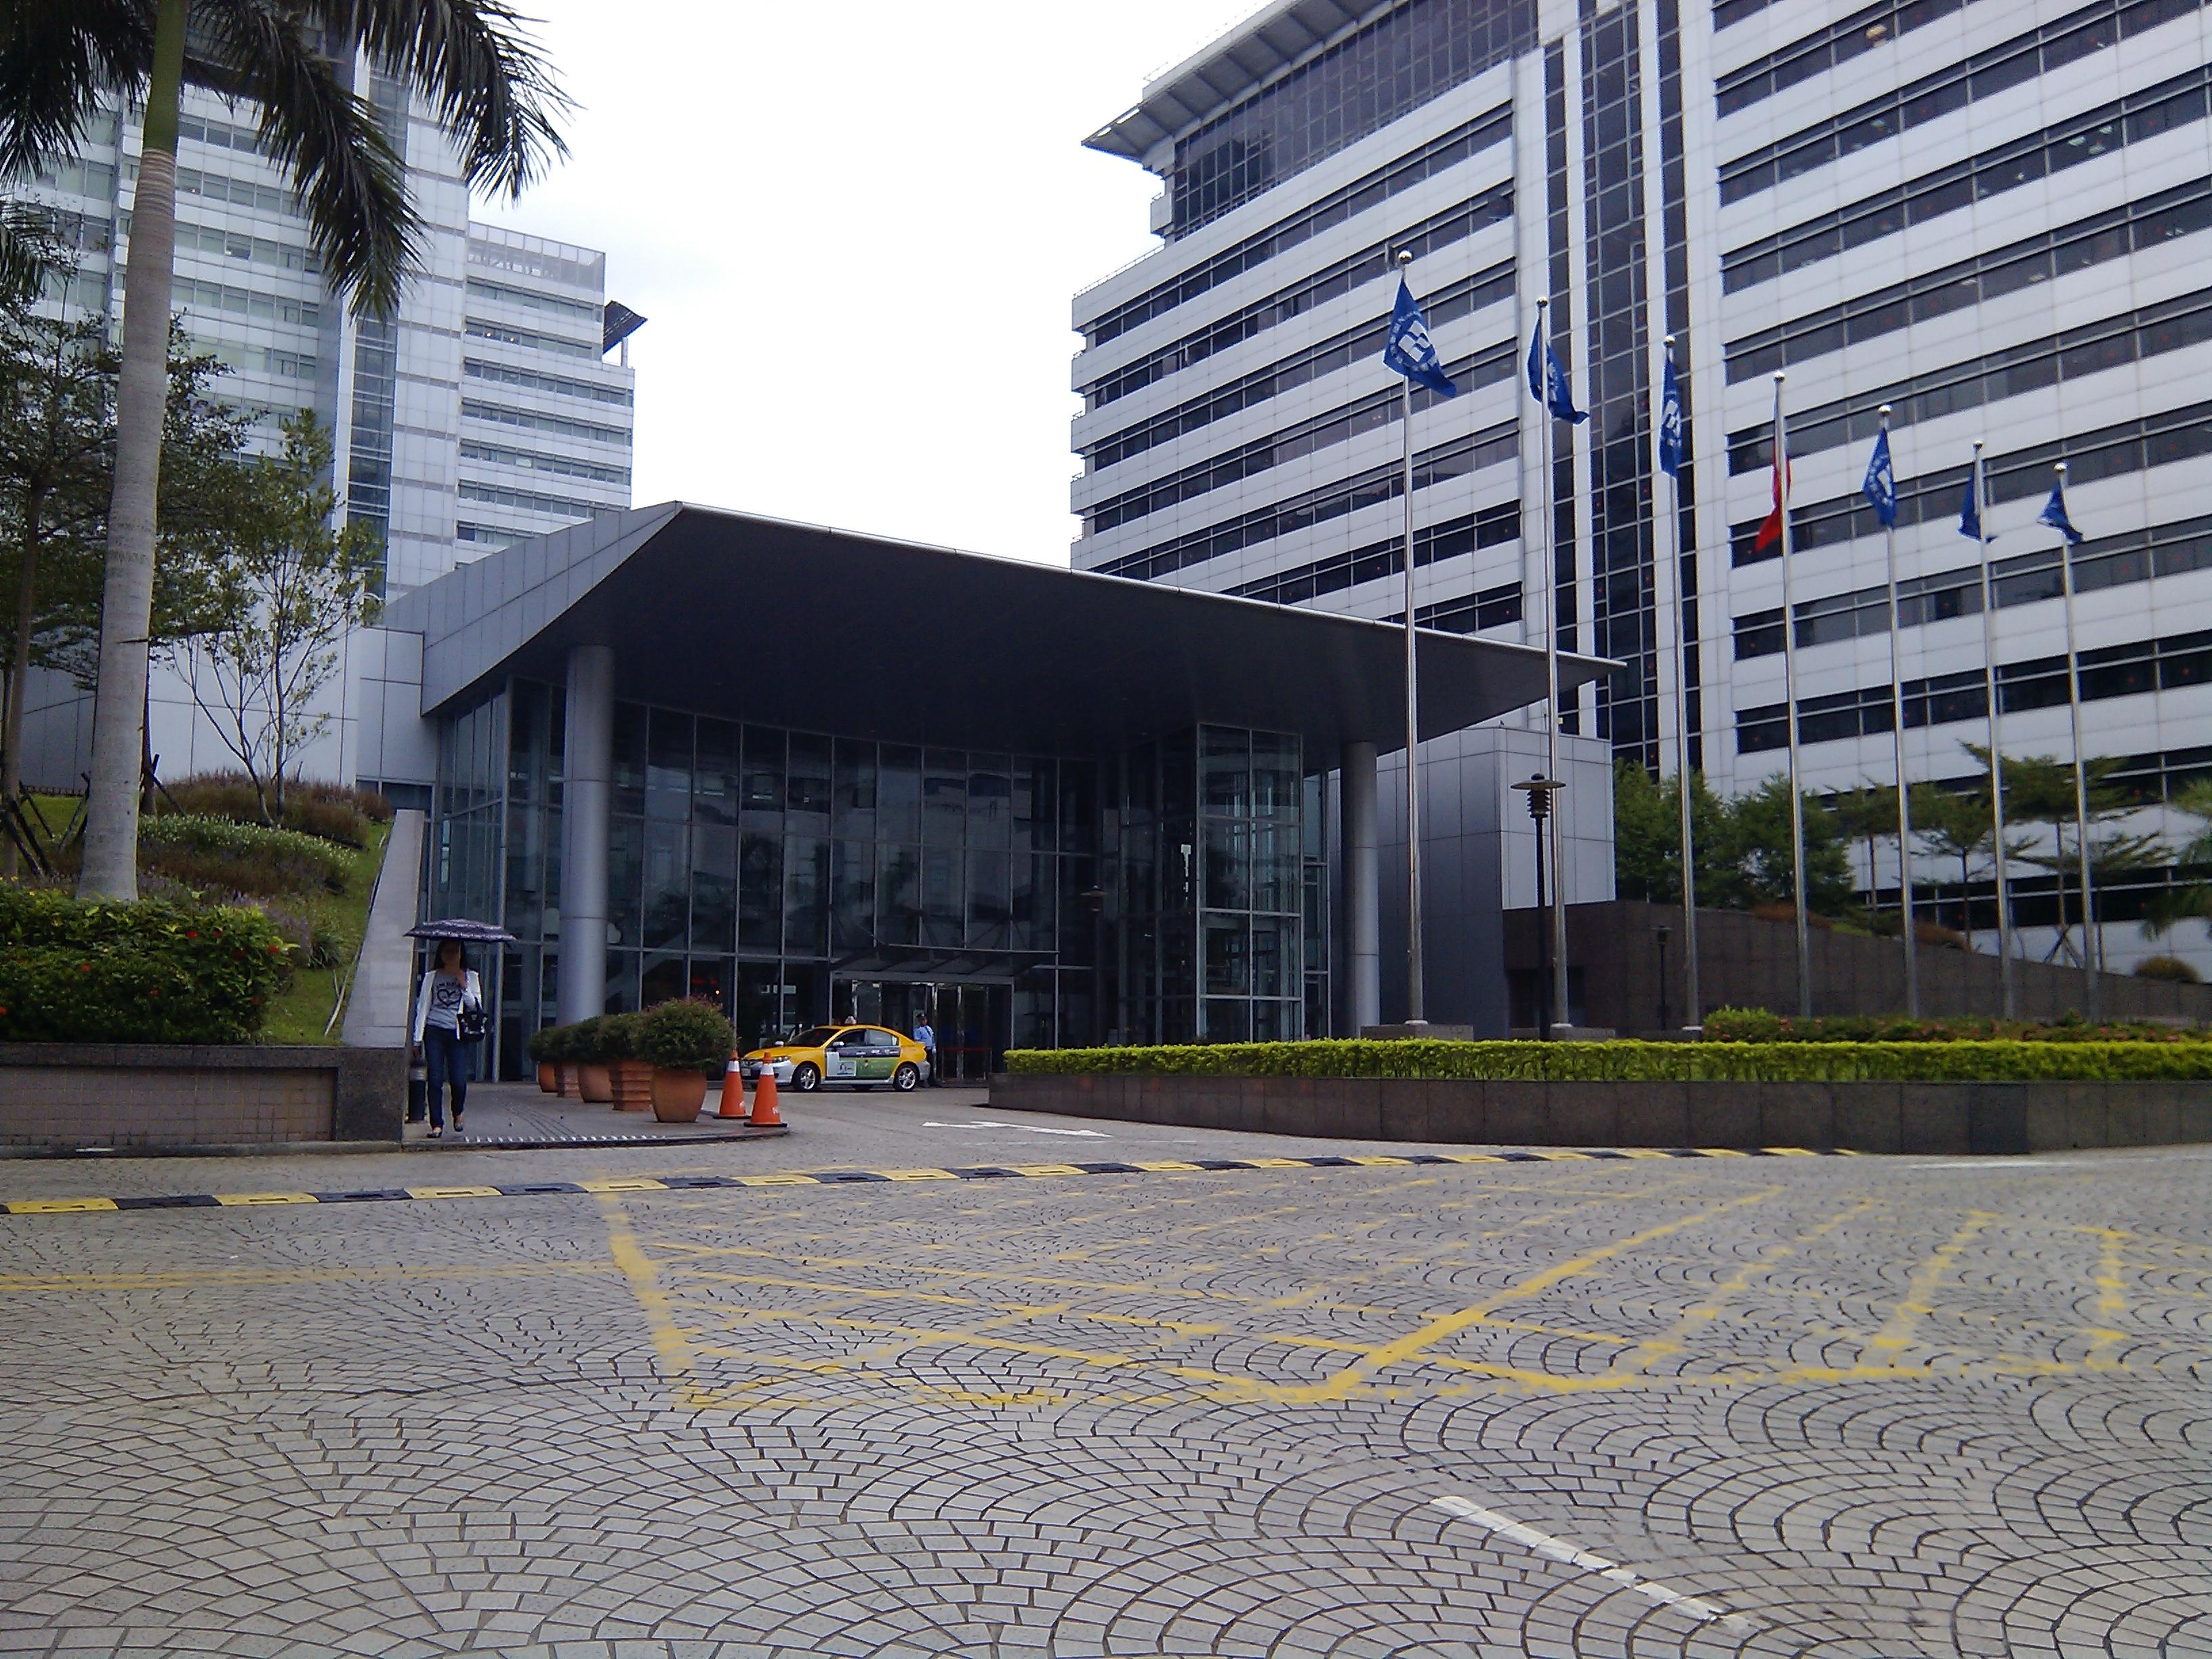 File:南港軟體園區(一期)大門.jpg - 維基百科,自由的百科全書